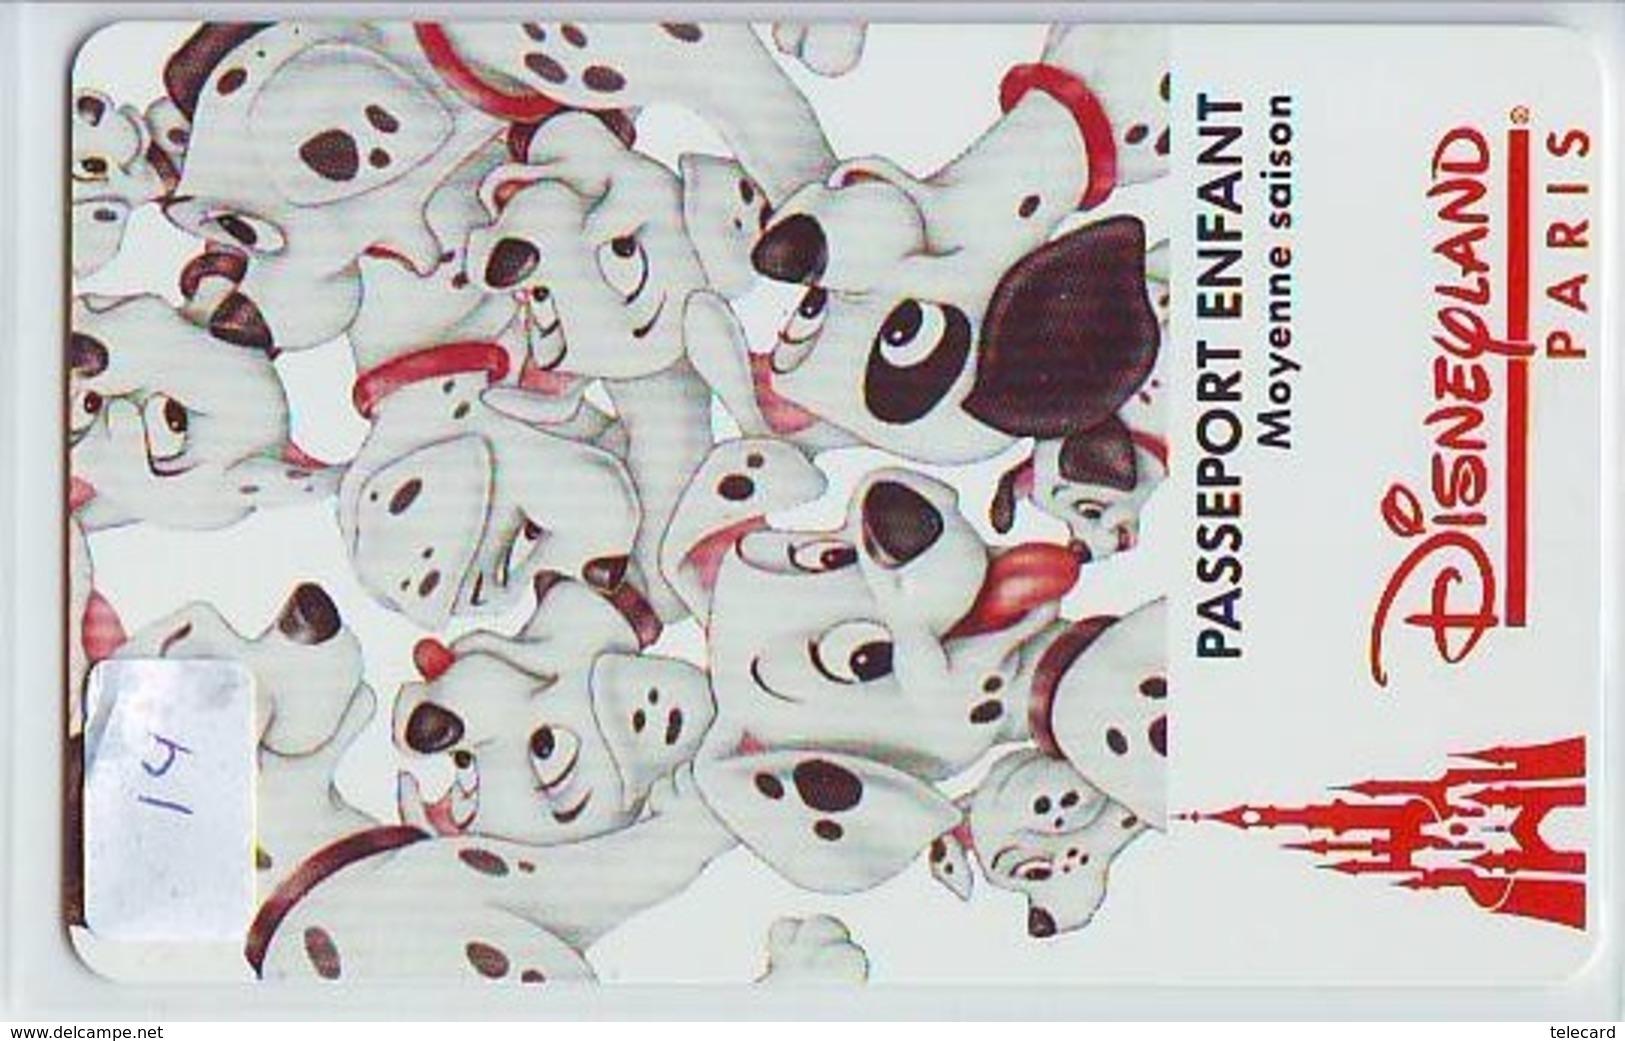 Disney PASSE-PARTOUT * Passeport Entreecard FRANCE * PARIS DISNEYLAND ENFANT (14) PASSPORT * PASS * DALMATIANS - Disney